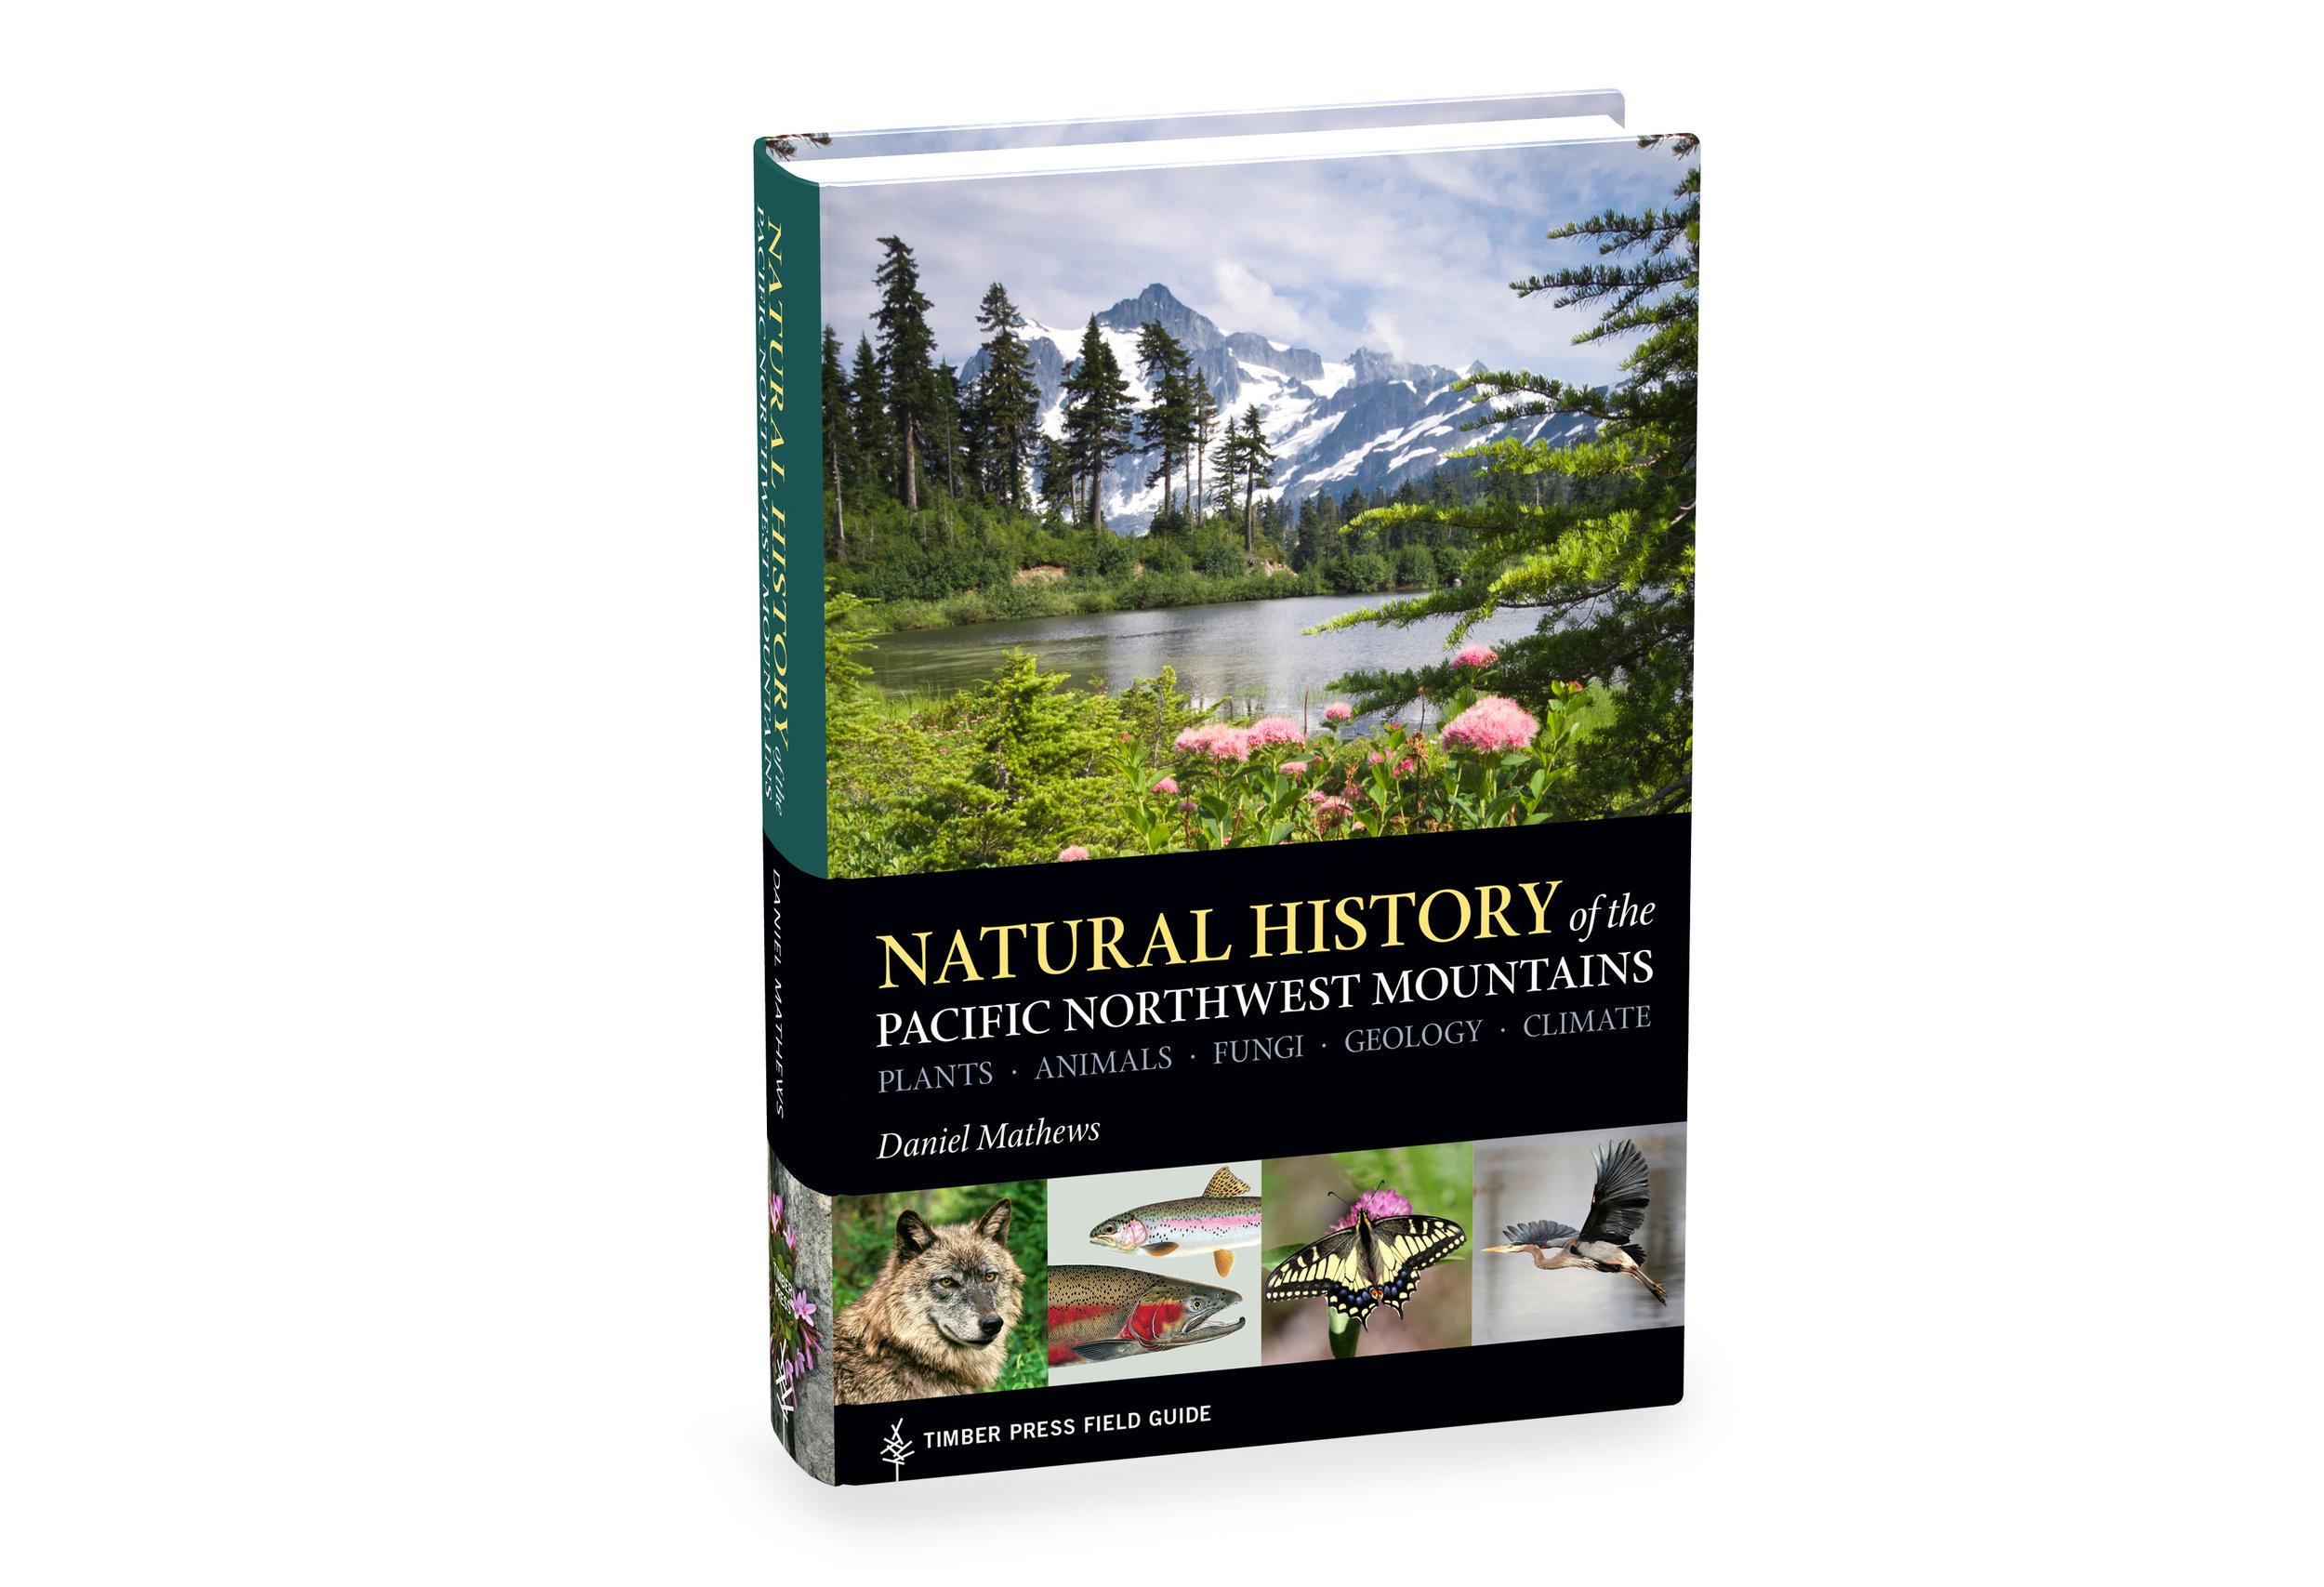 book_fieldguidenaturalhistory_cover_003.jpg